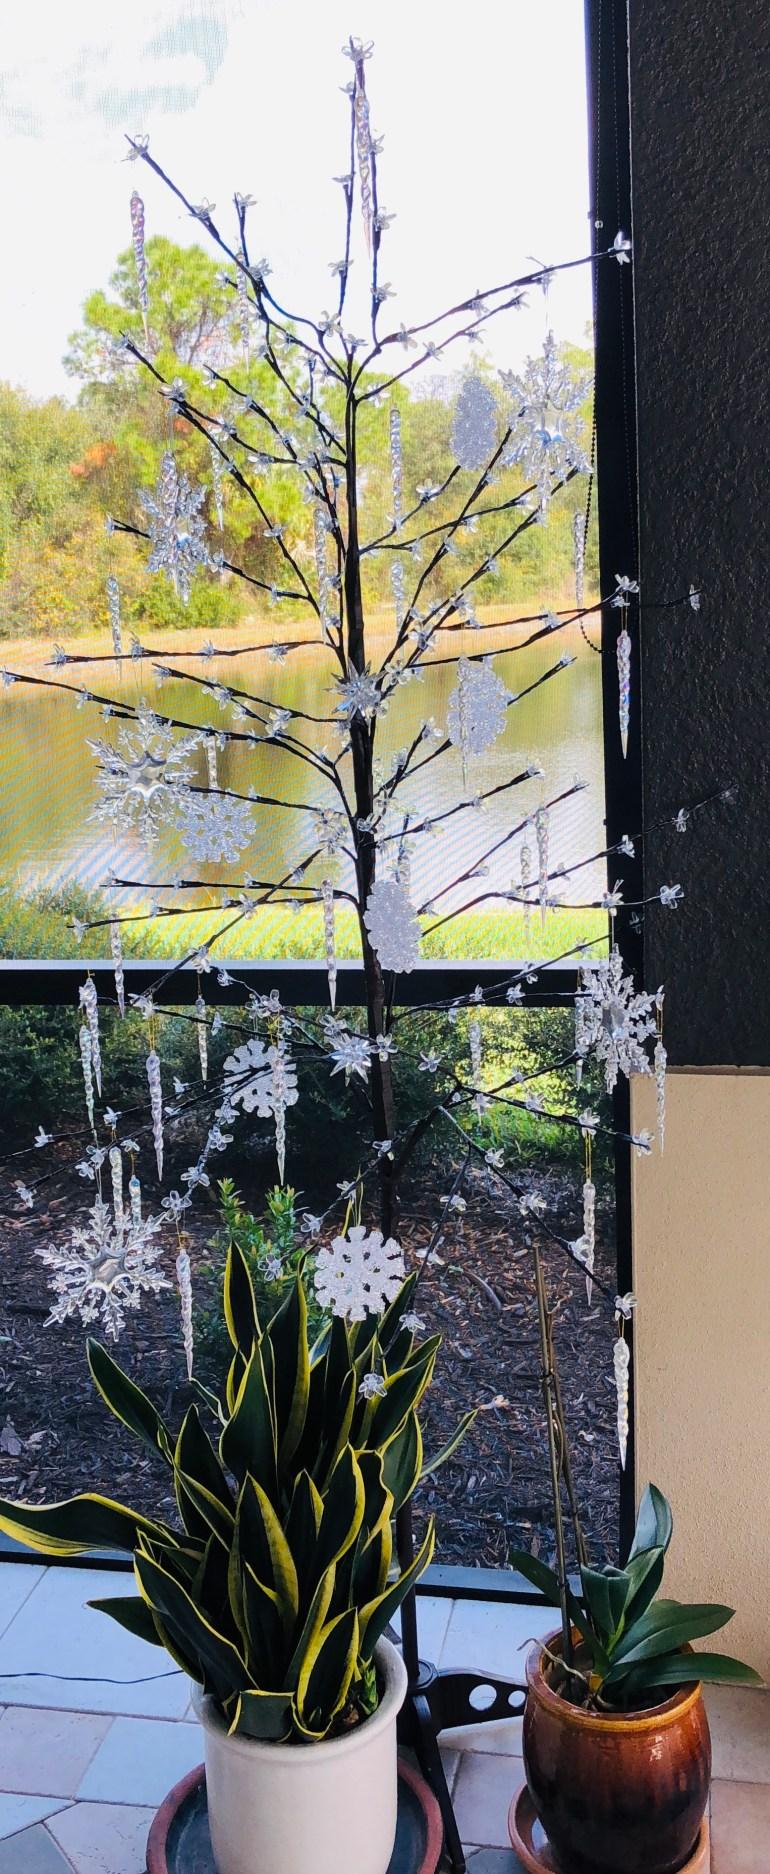 laurelbledsoedesign-minimalistic-holiday decor-patio-christmas-tree